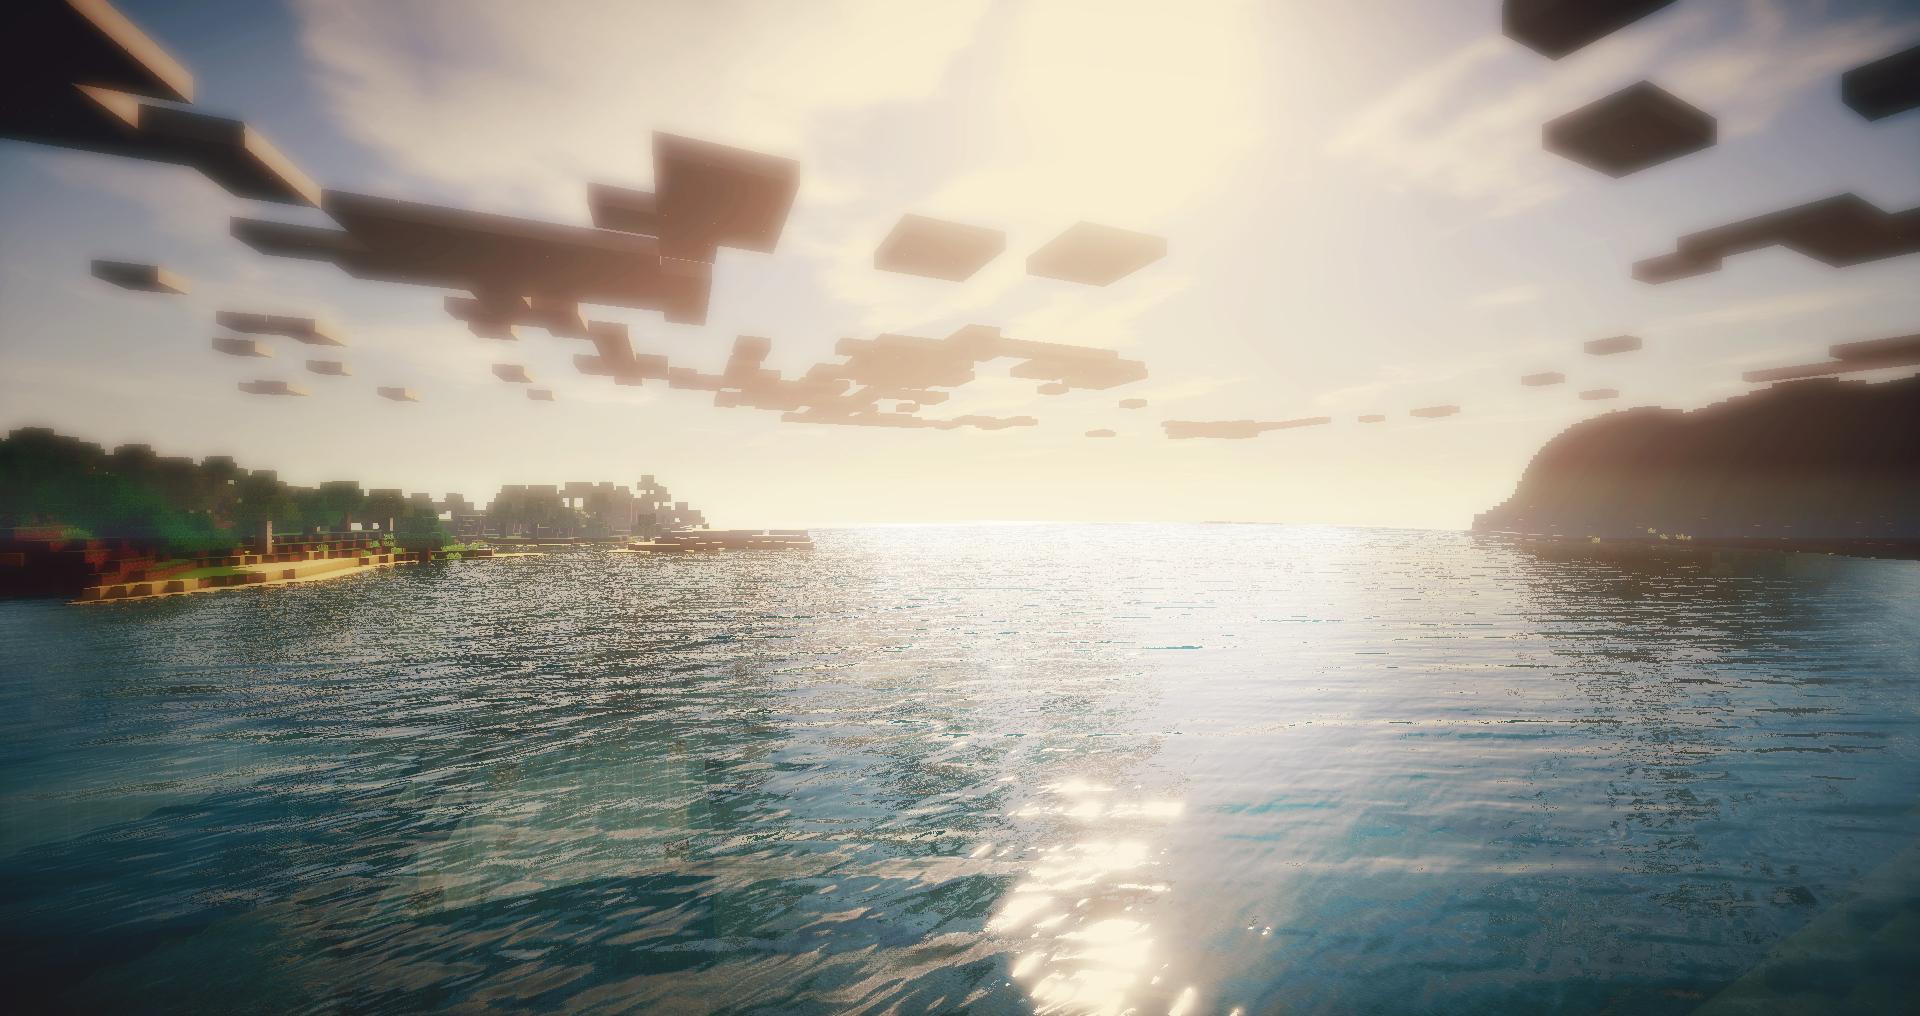 Beautiful Wallpaper Minecraft Beach - sunlight-sunset-sea-bay-reflection-sky-vehicle-beach-sunrise-Minecraft-evening-morning-coast-Sun-horizon-dusk-cloud-dawn-ocean-wave-56914  Snapshot_651046.png